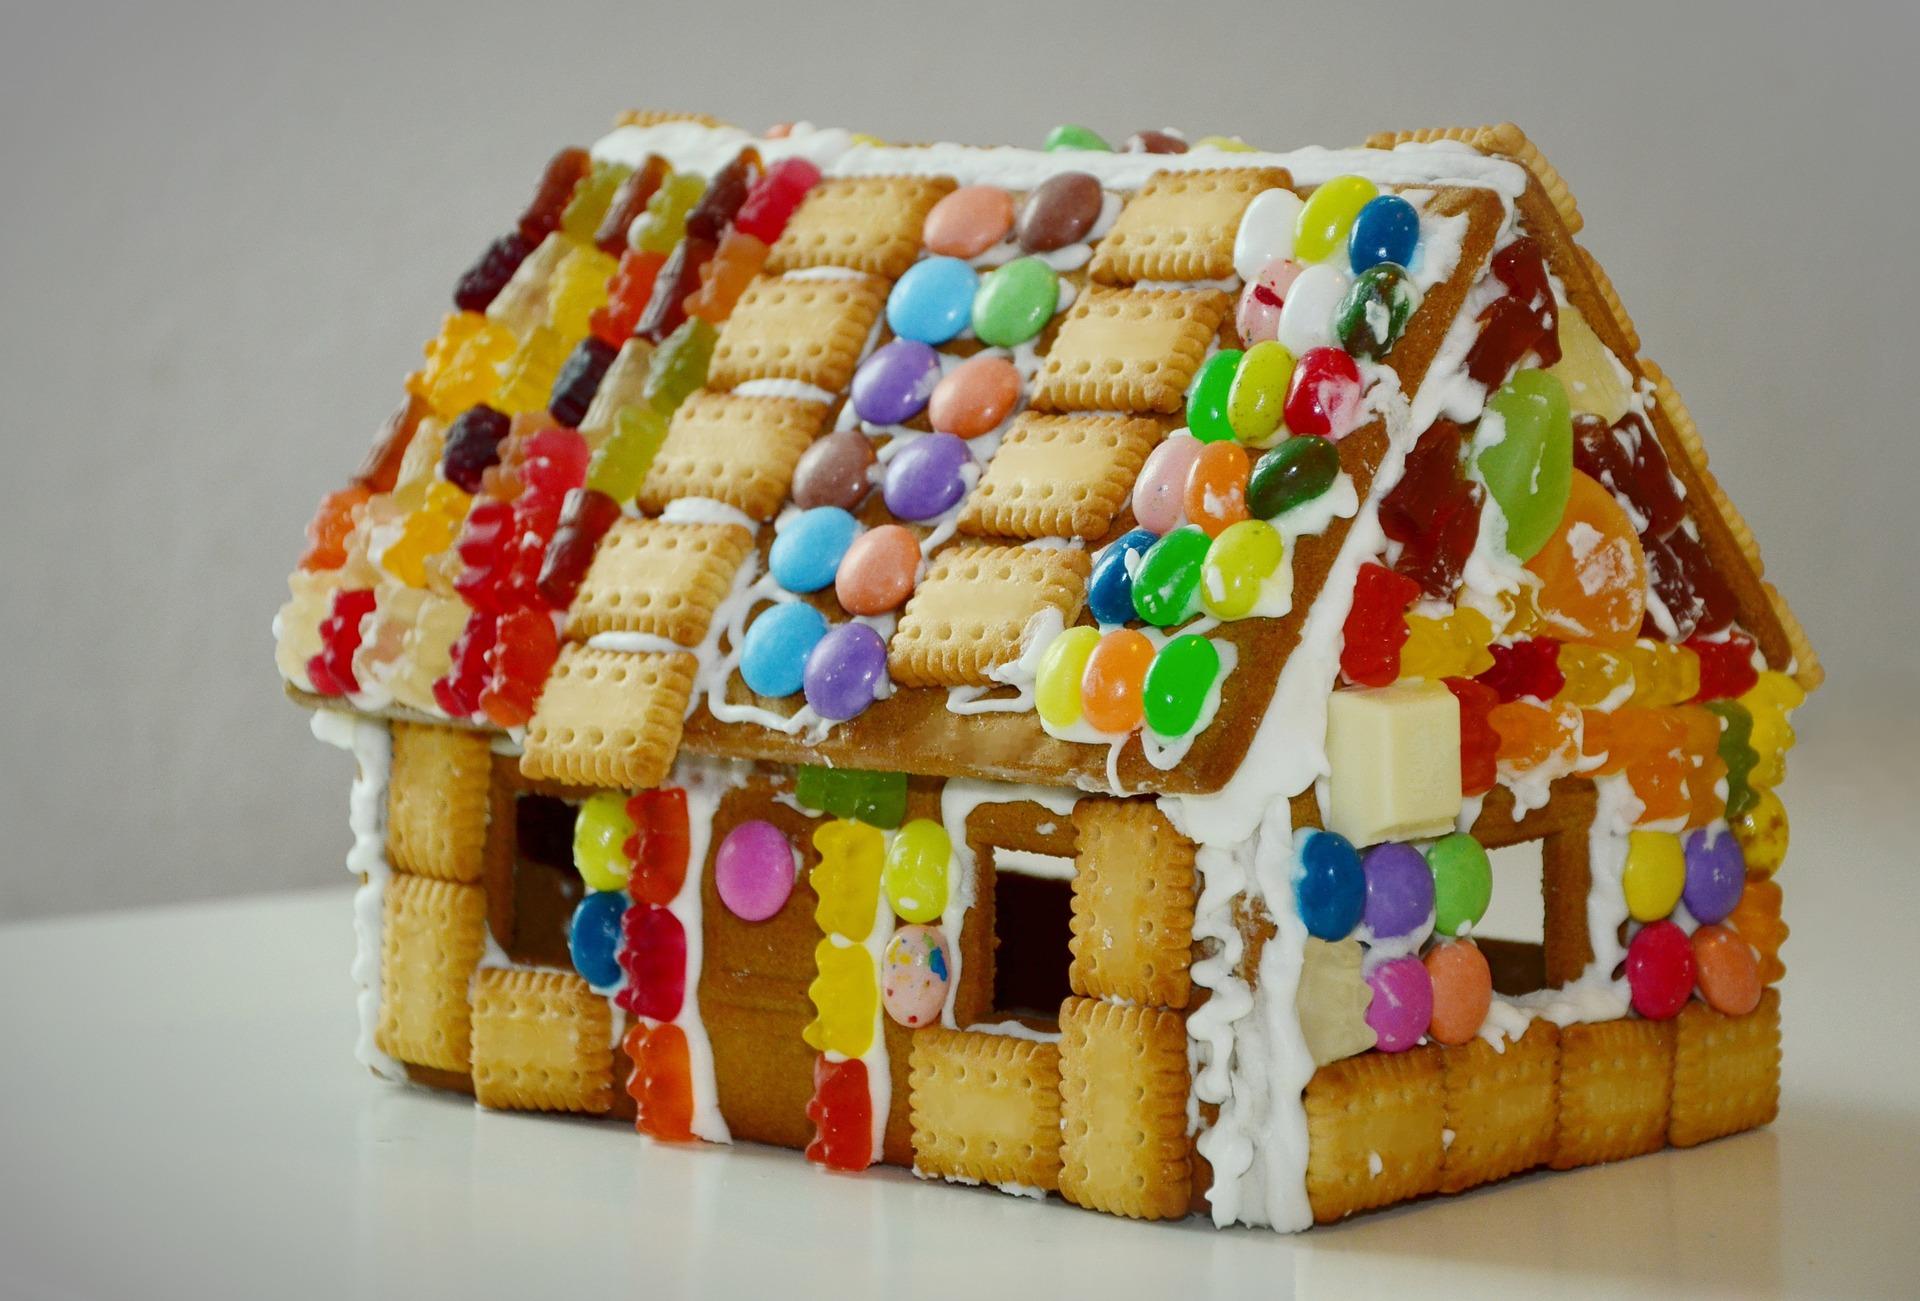 gingerbread-house-1098731_1920.jpg